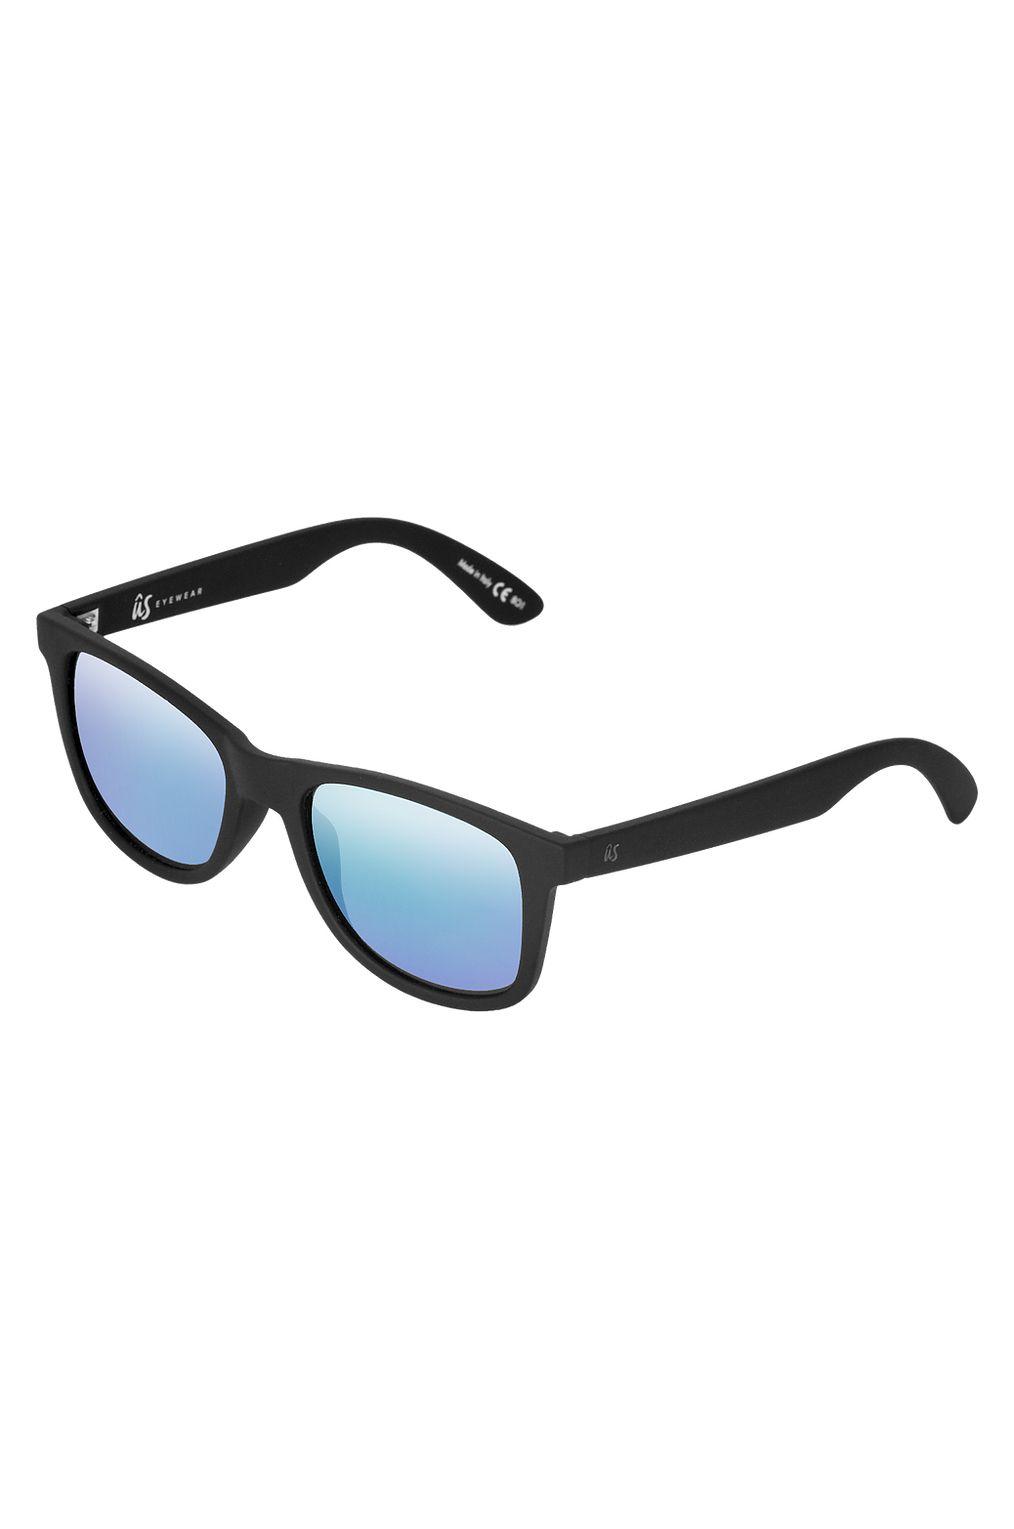 US Sunglasses MATY Matte Black/Grey Blue Chrome